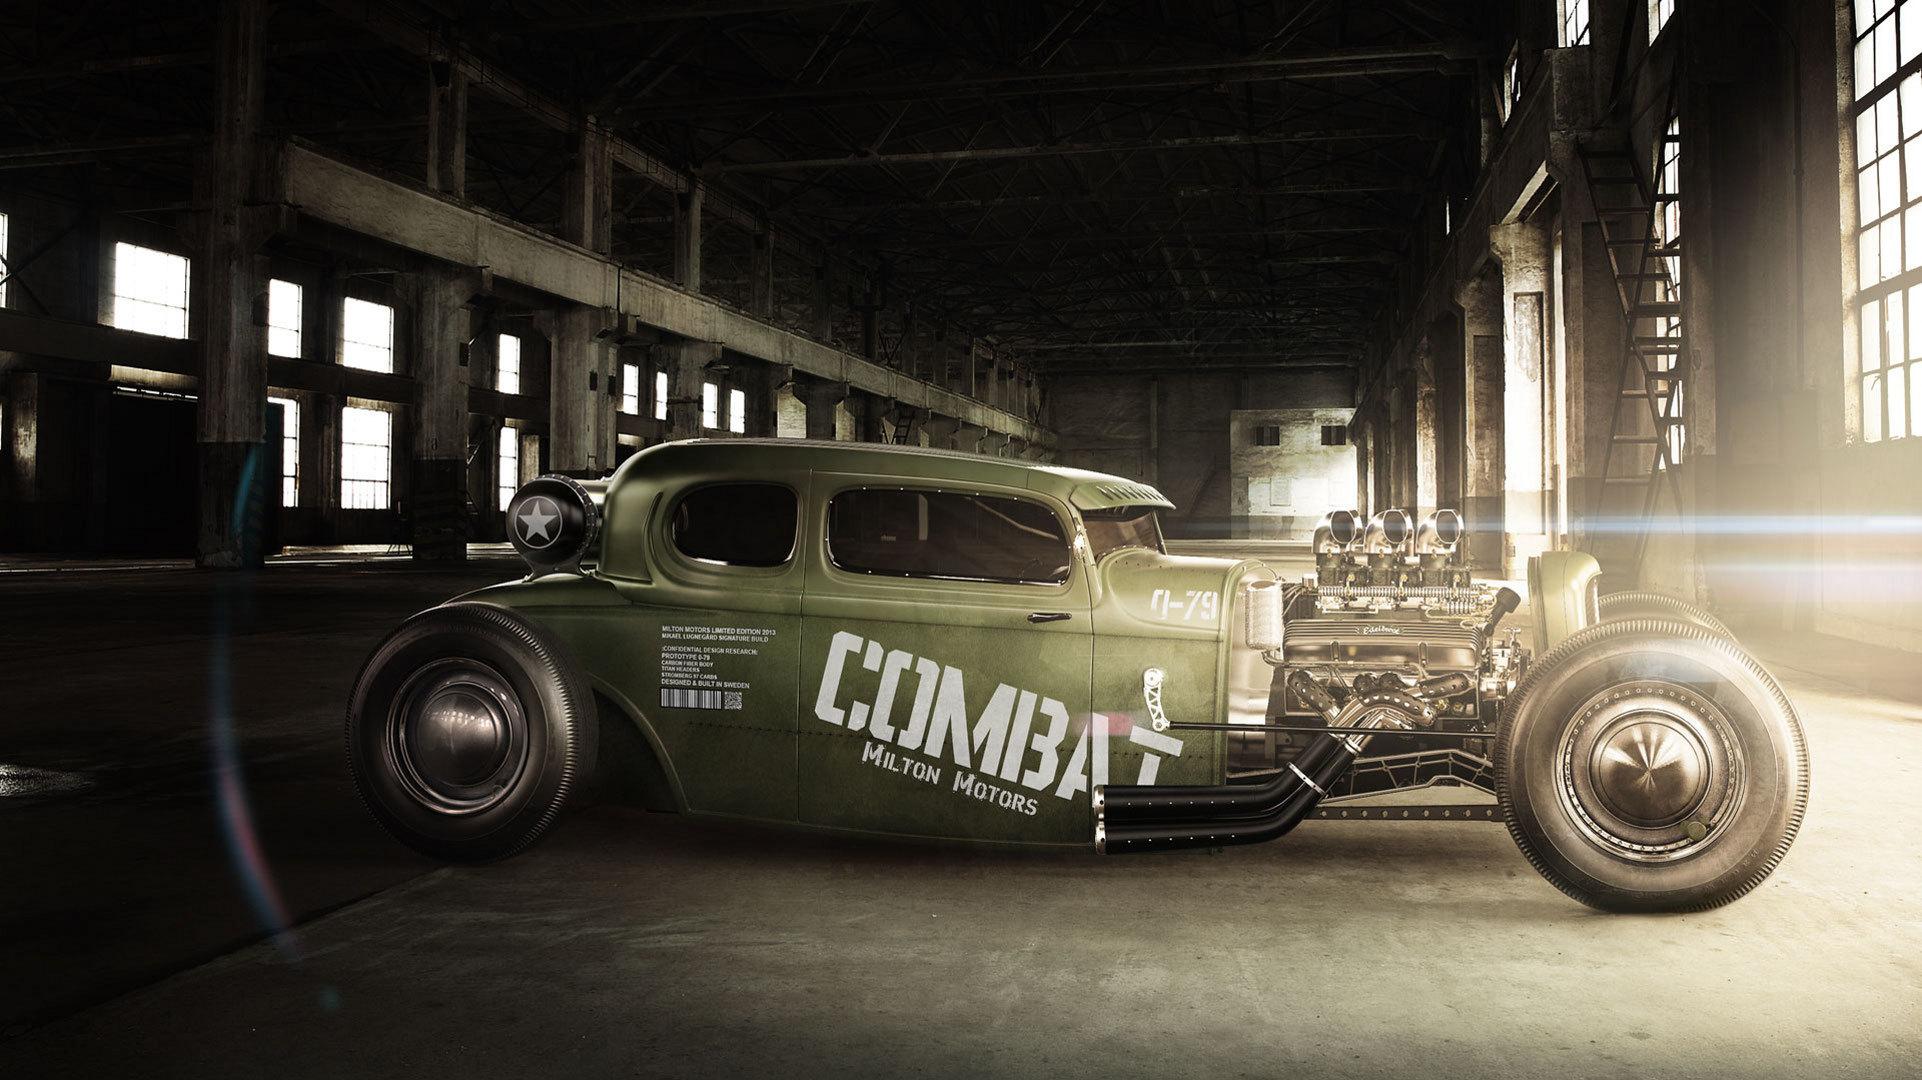 Custom hot rod rods retro rat engine f wallpaper 1922x1080 176540 1922x1080